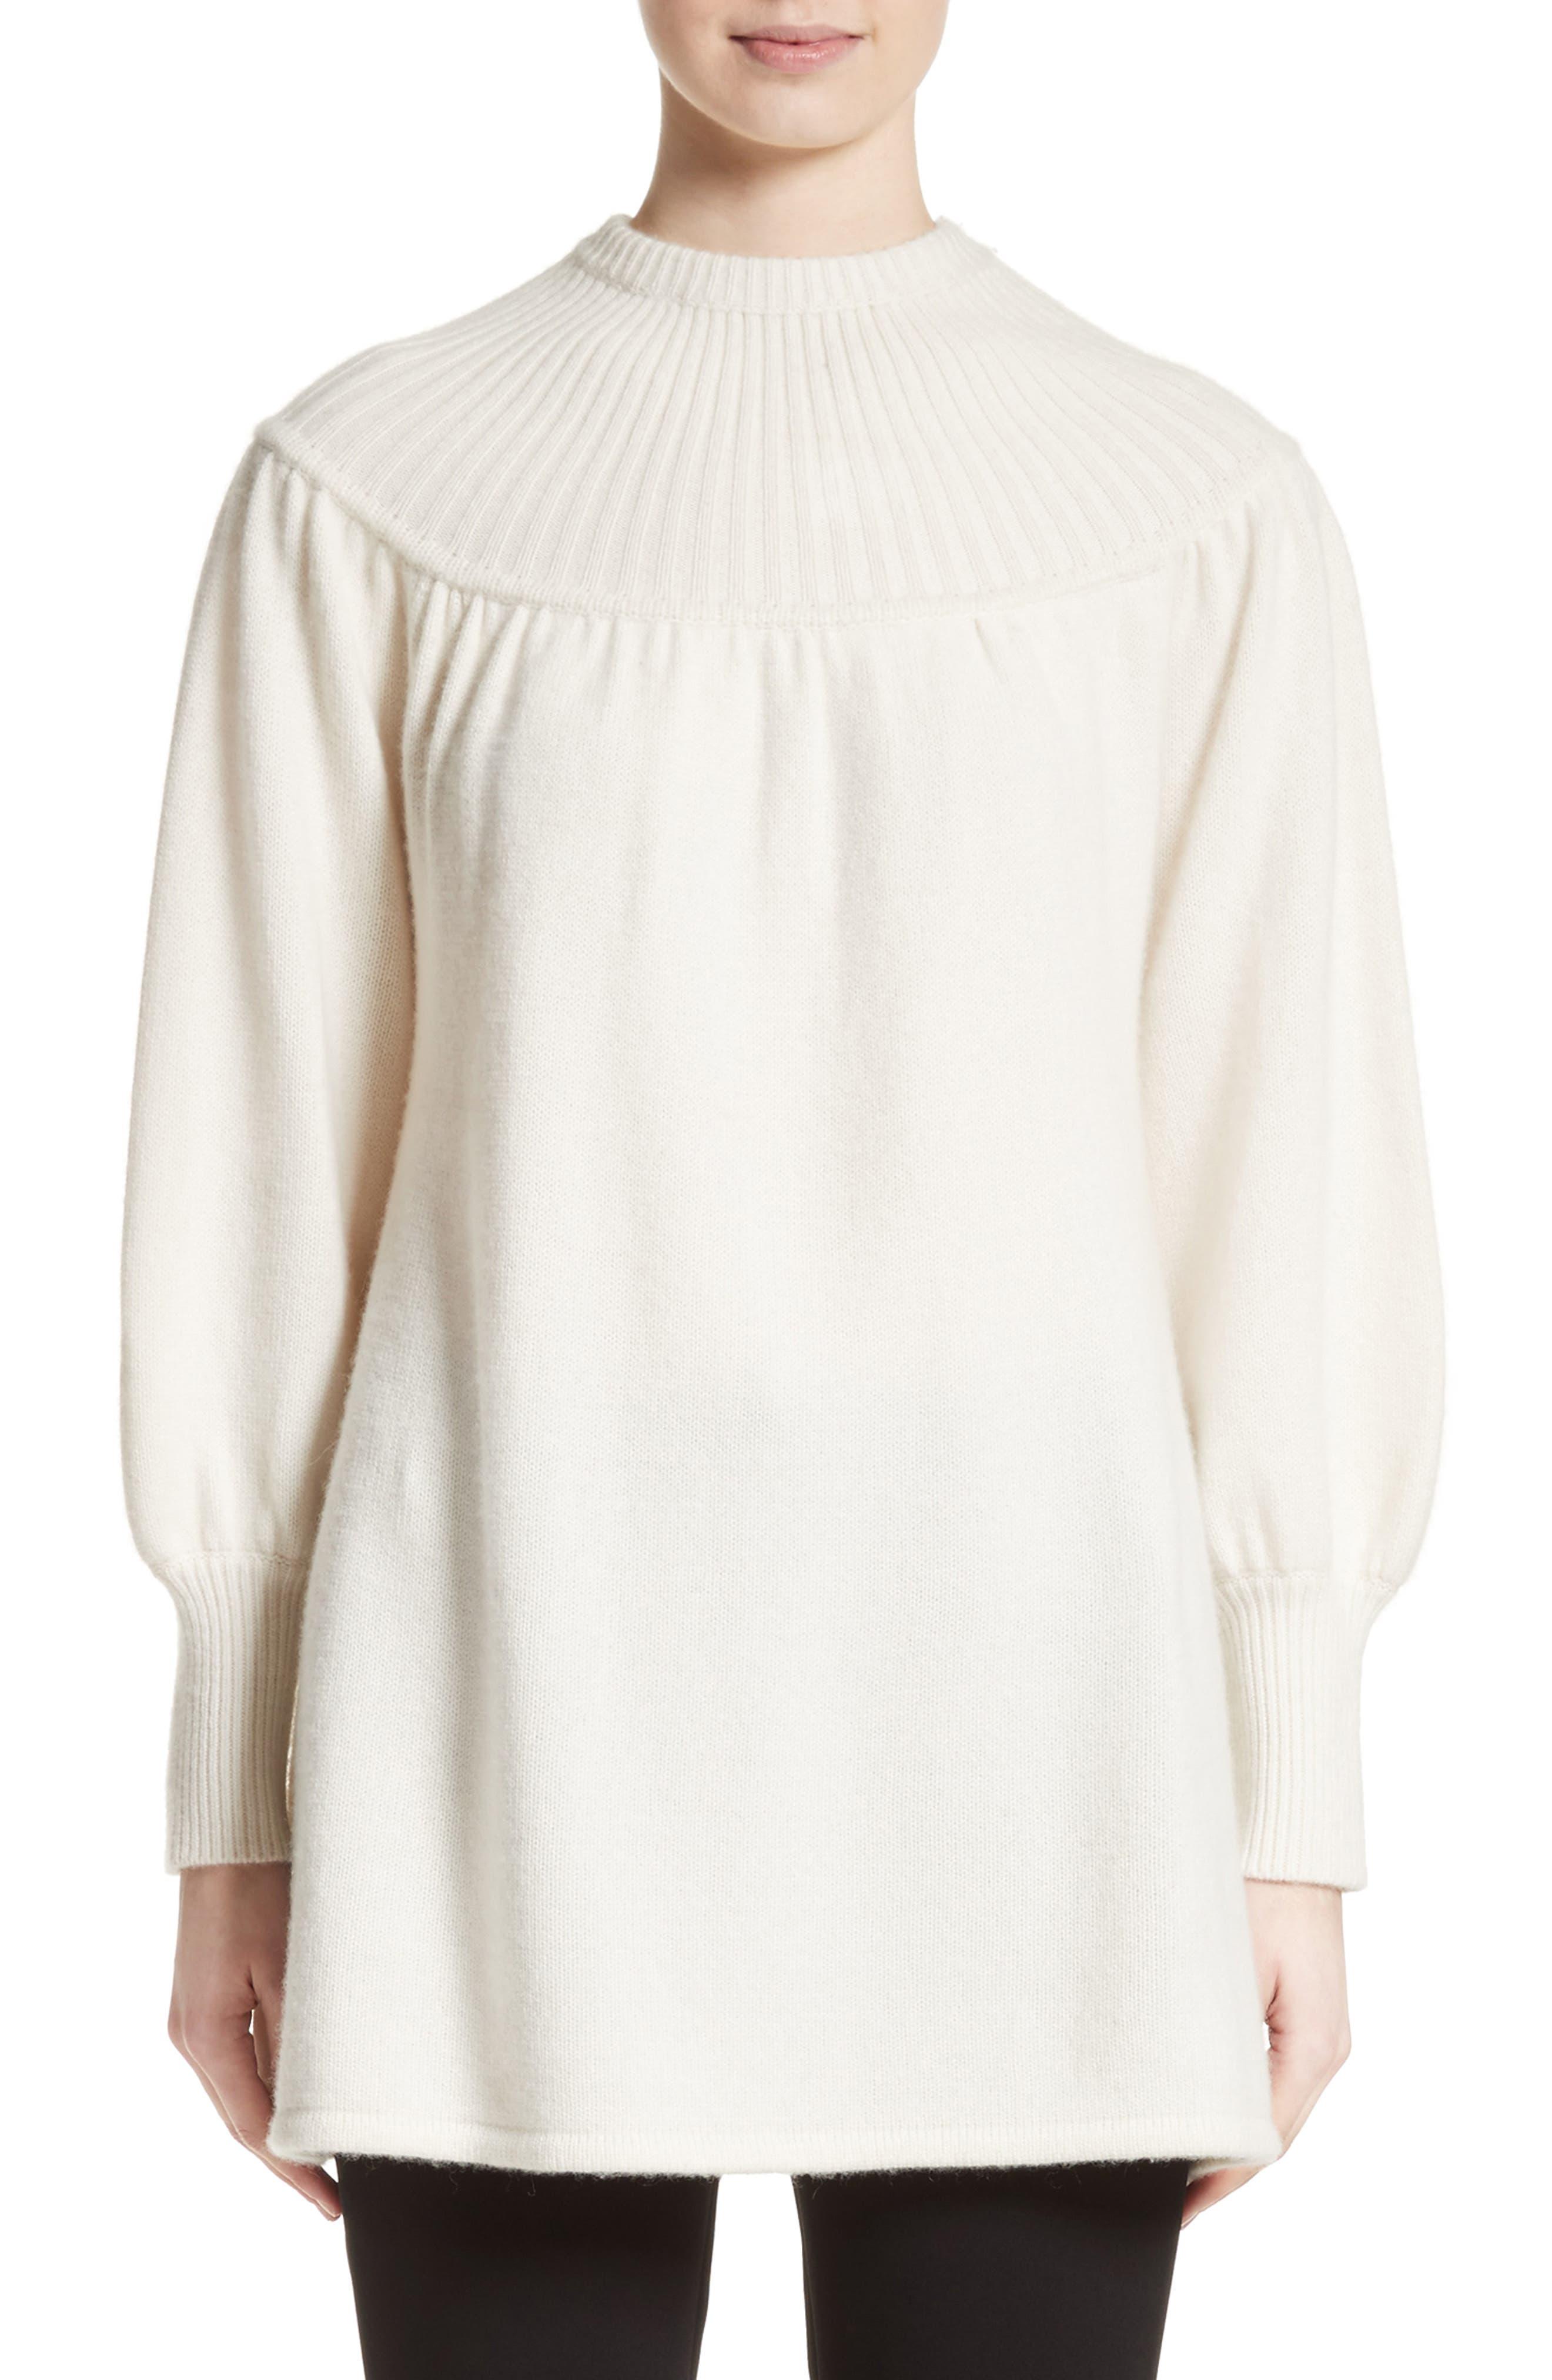 Rib Knit Cashmere Tunic Sweater,                             Main thumbnail 1, color,                             900